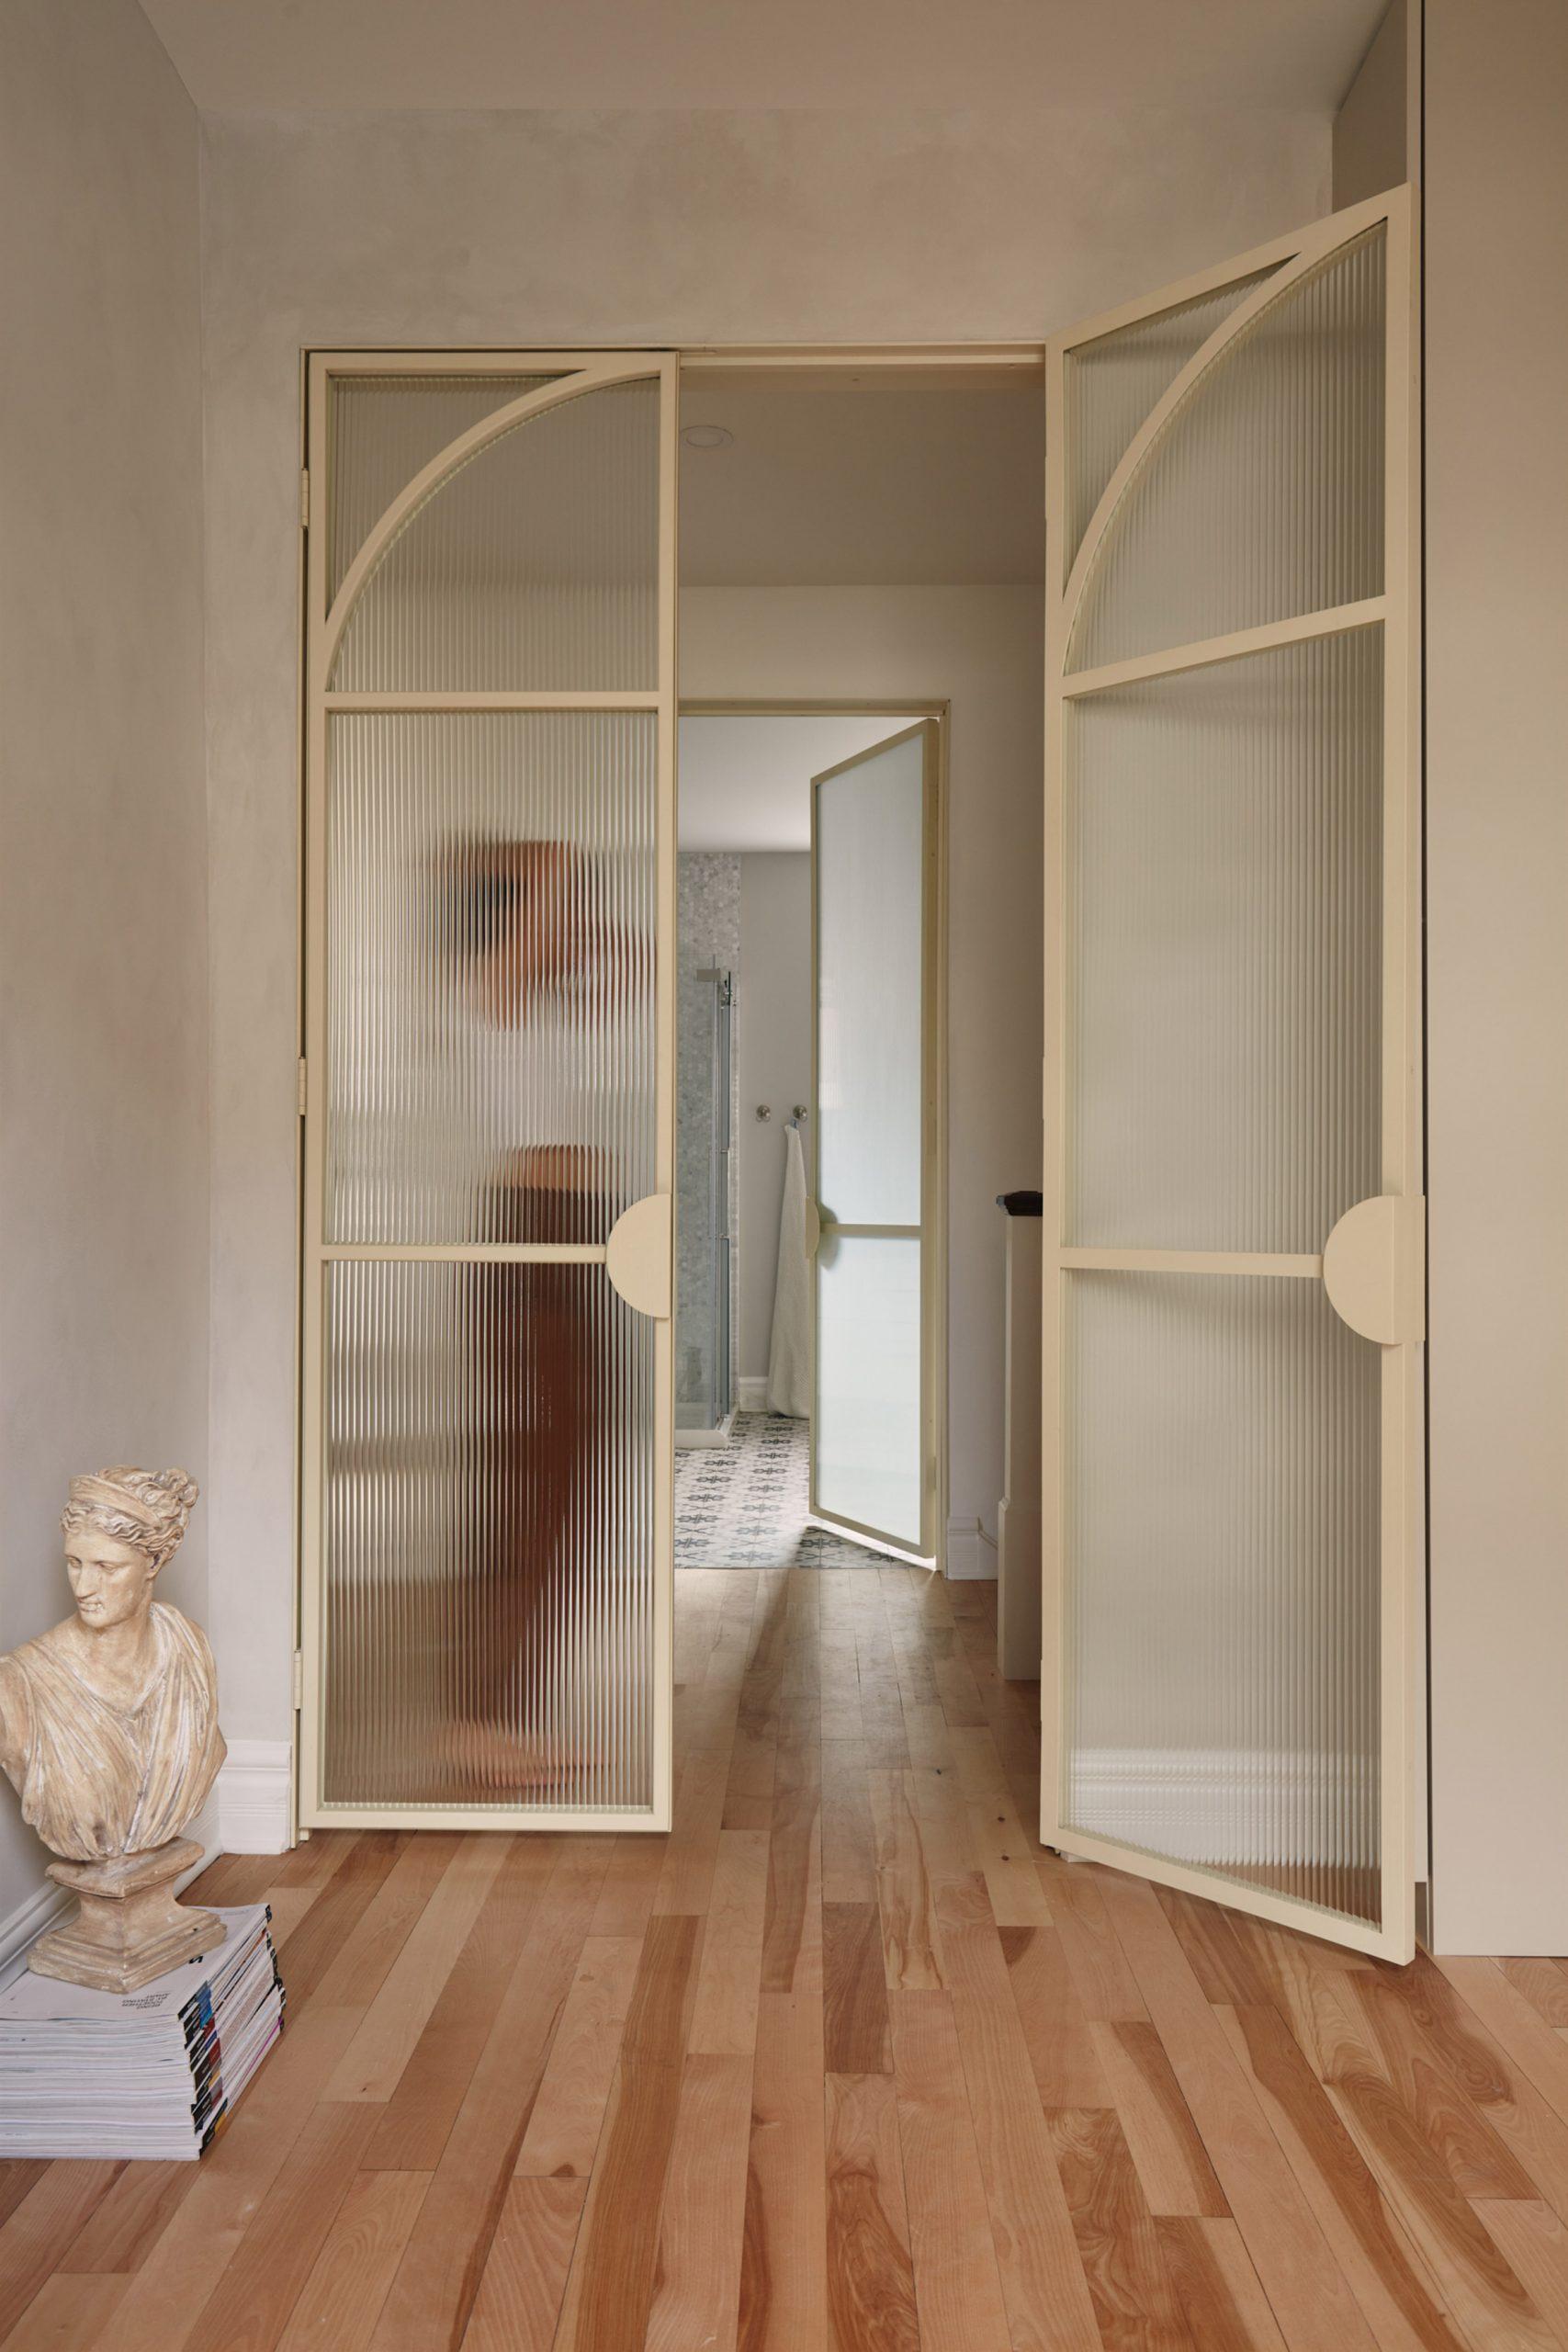 Résidence Esplanade in Montreal has fluted glass doors